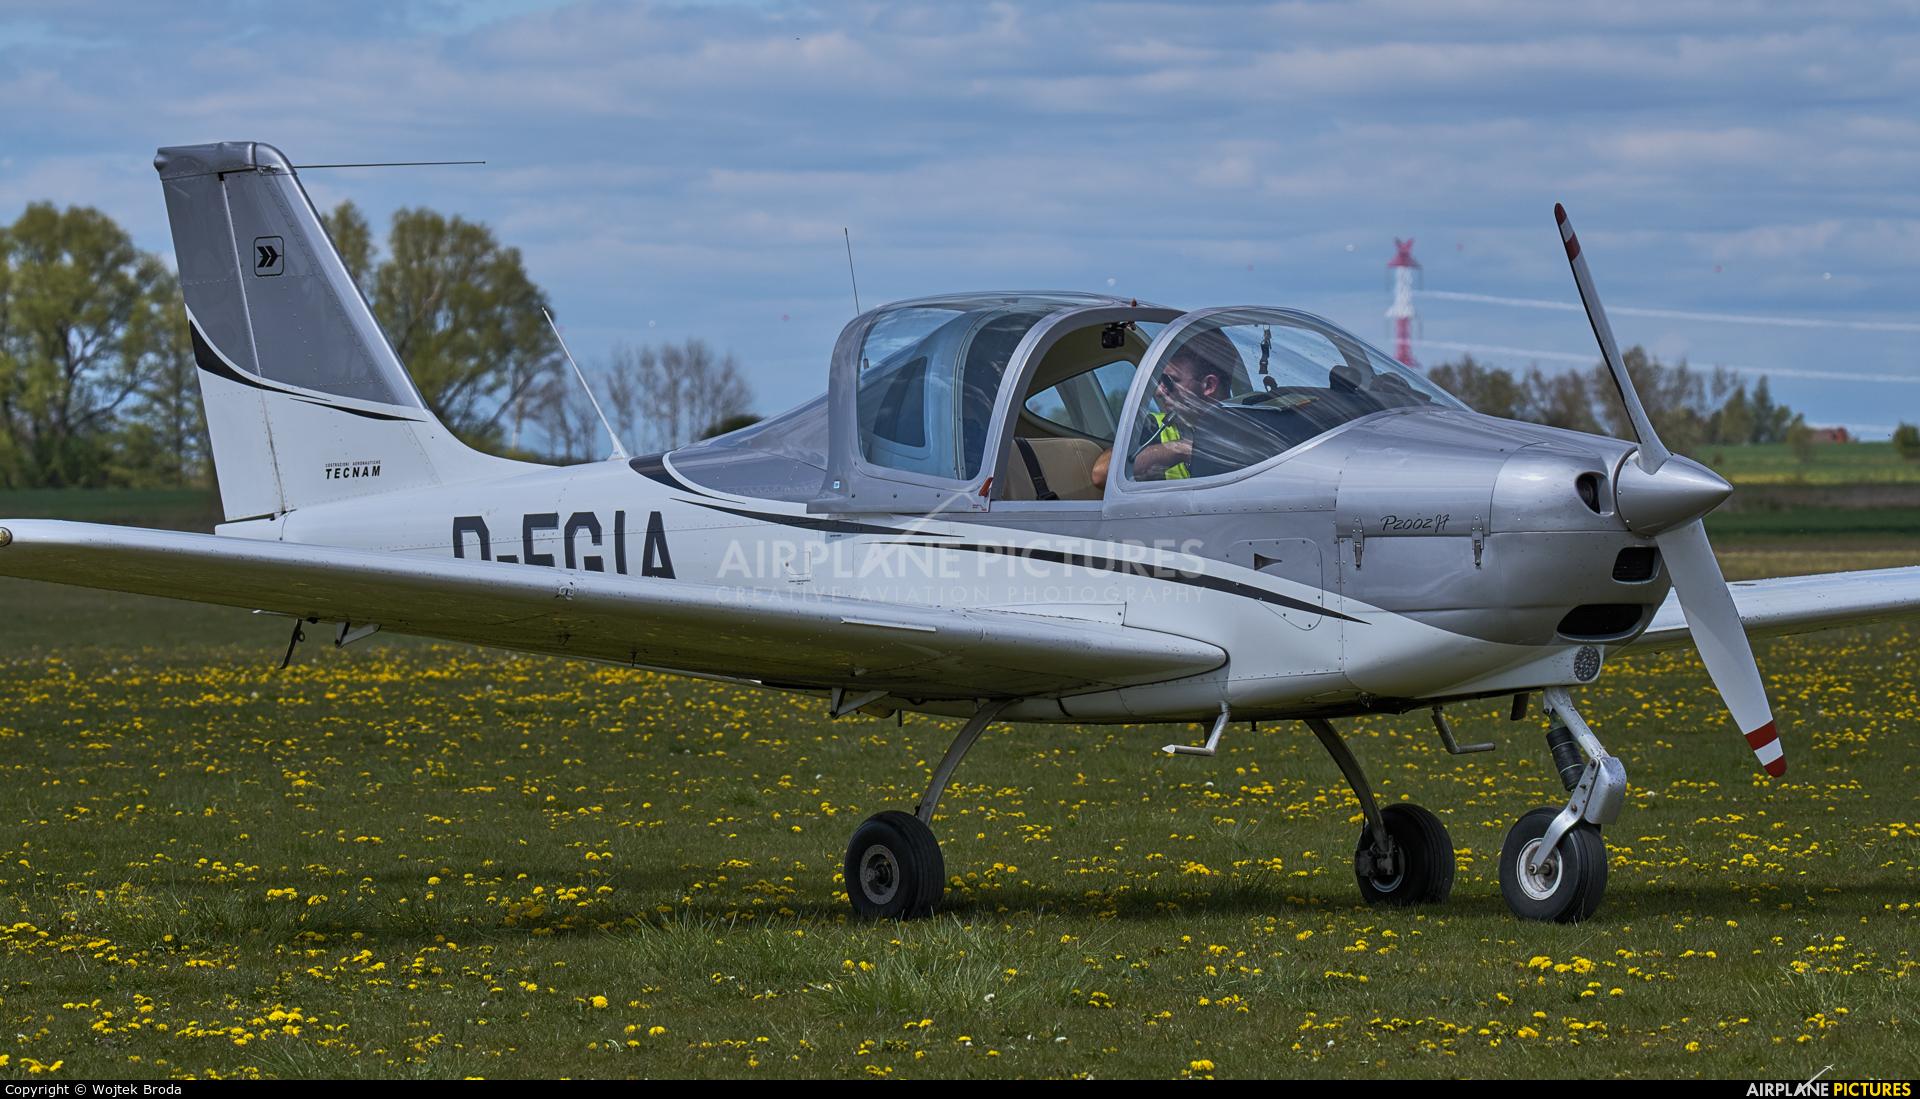 Private D-EGIA aircraft at Wrocław - Szymanów